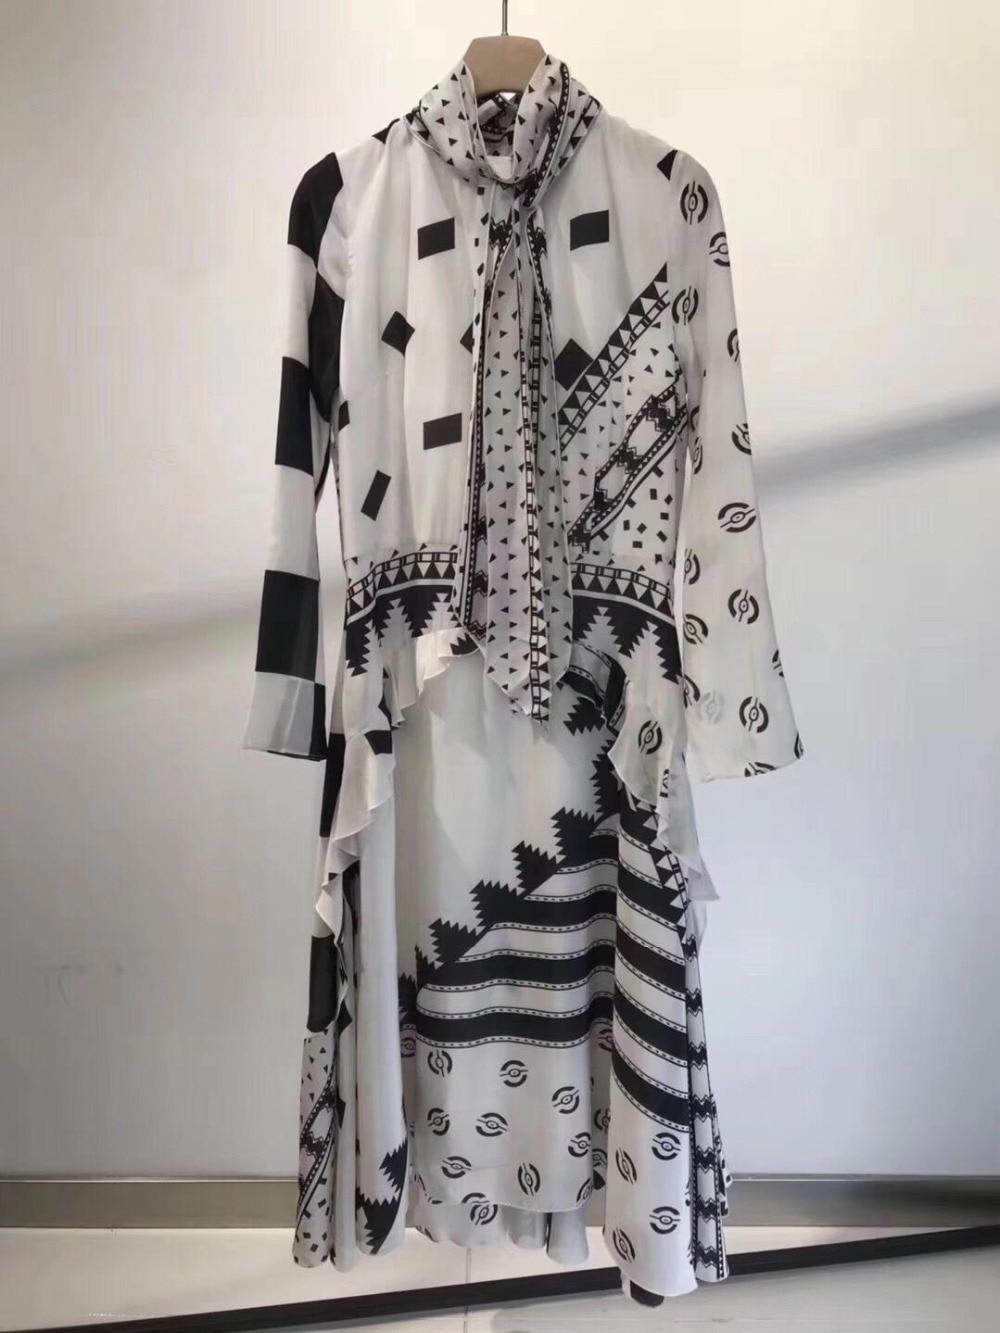 2019 new ladies fashion long sleeved turtleneck geometric print dress 0423